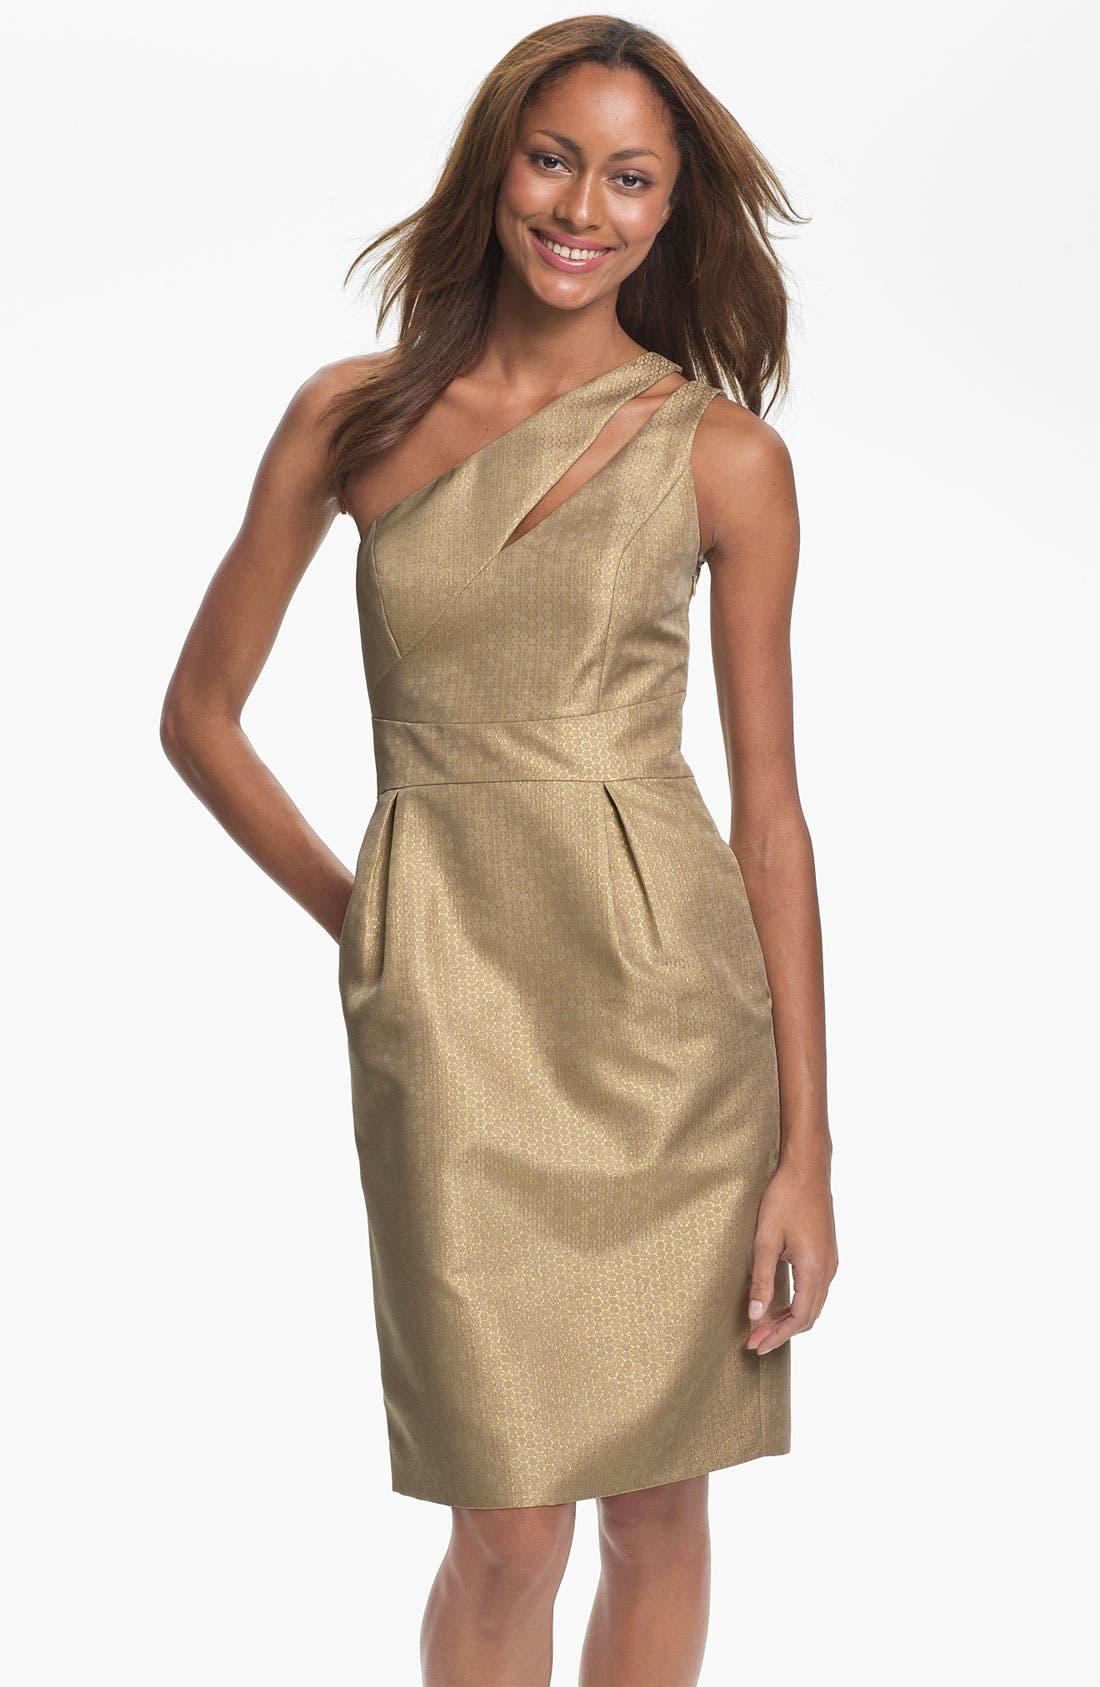 Main Image - ML Monique Lhuillier Bridesmaids One Shoulder Metallic Woven Sheath Dress (Nordstrom Exclusive)